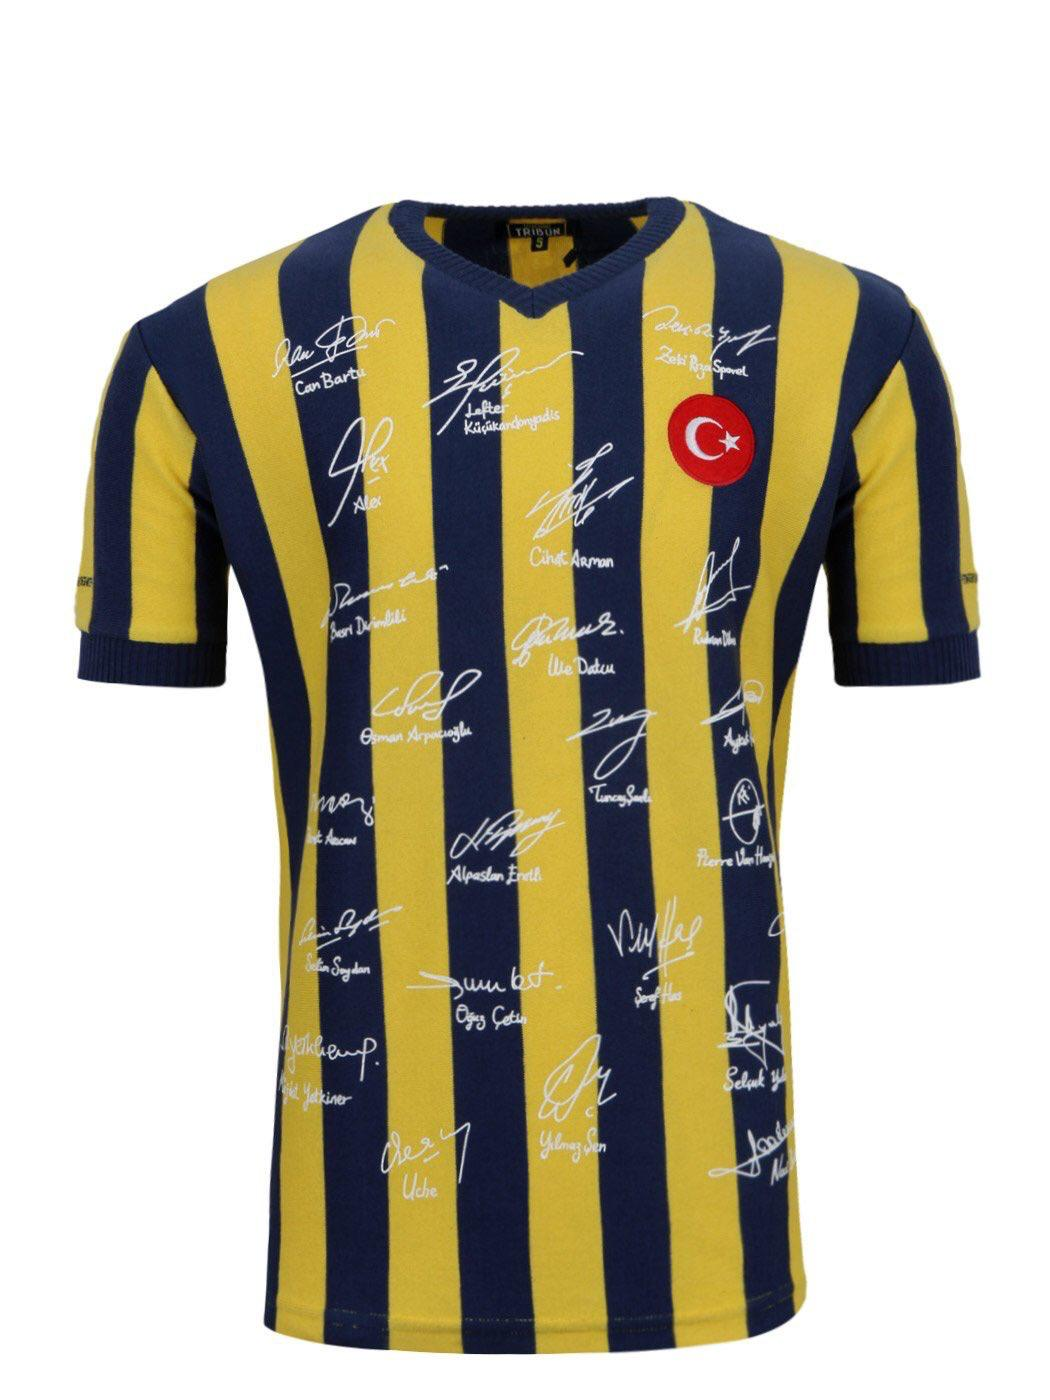 Fenerbahçe / WinWin Kampanyası! Unsere Trikots sind da